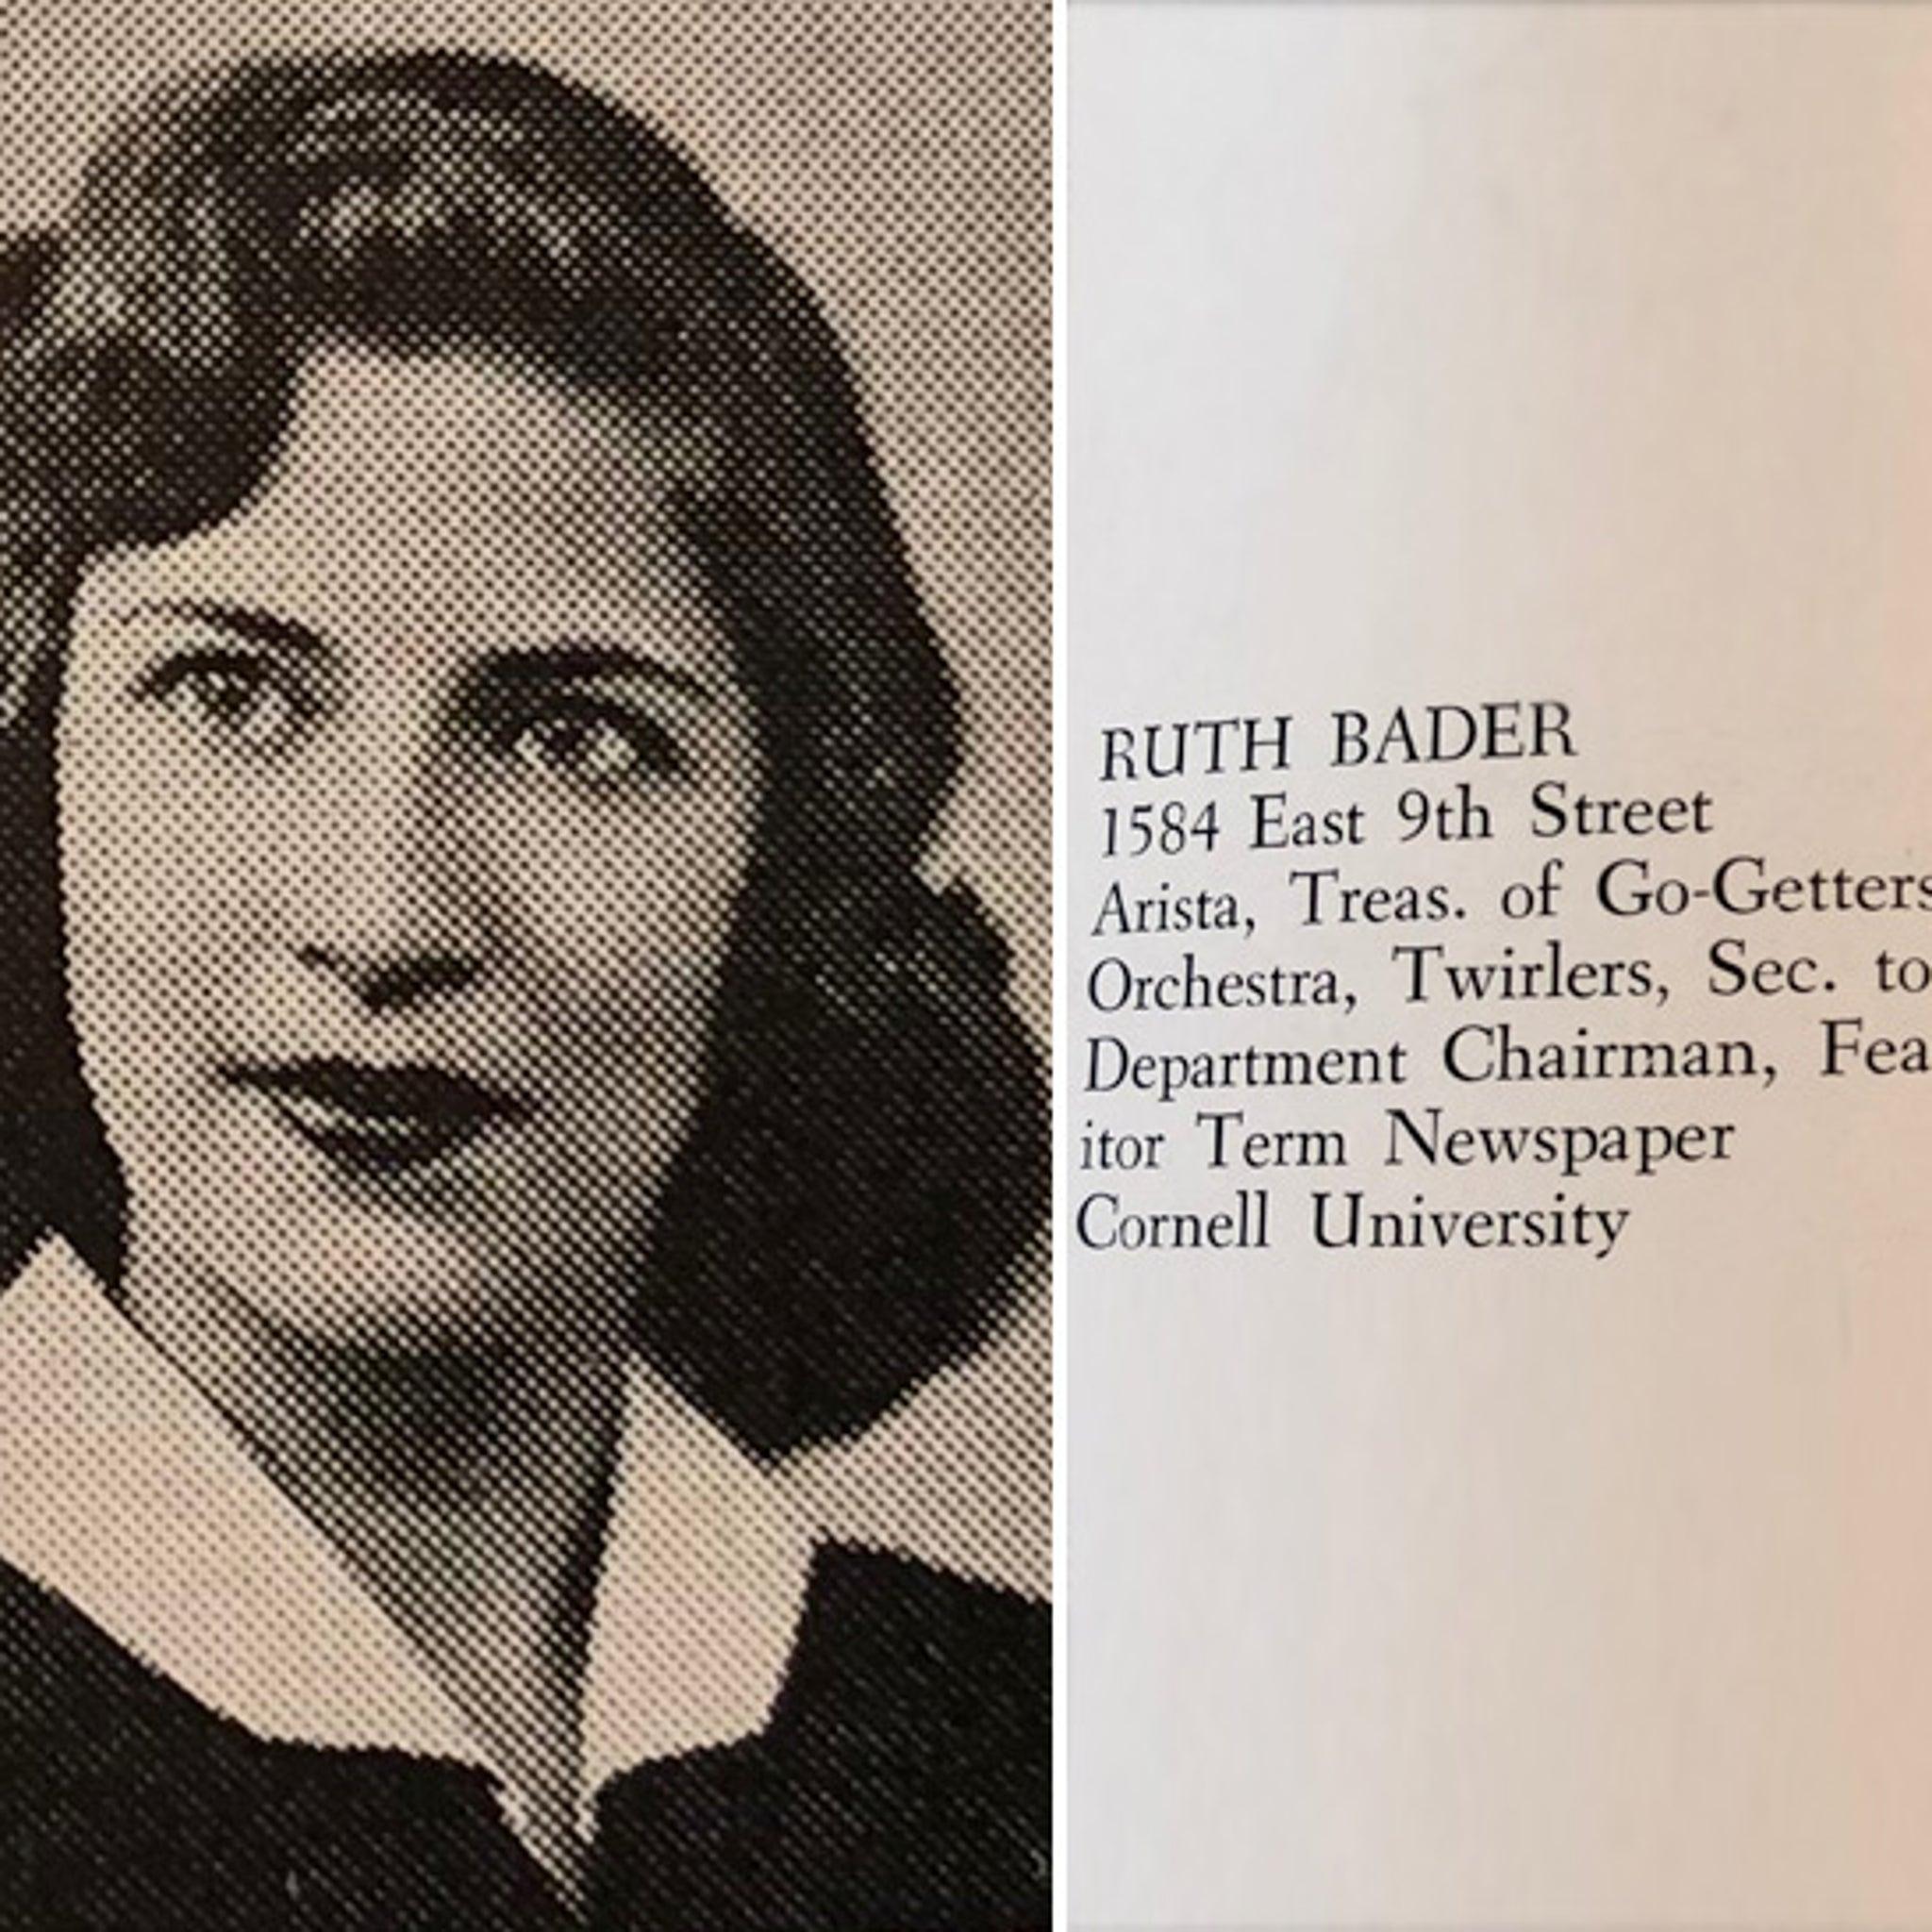 Ruth Bader Ginsburg Was a High School 'Twirler'